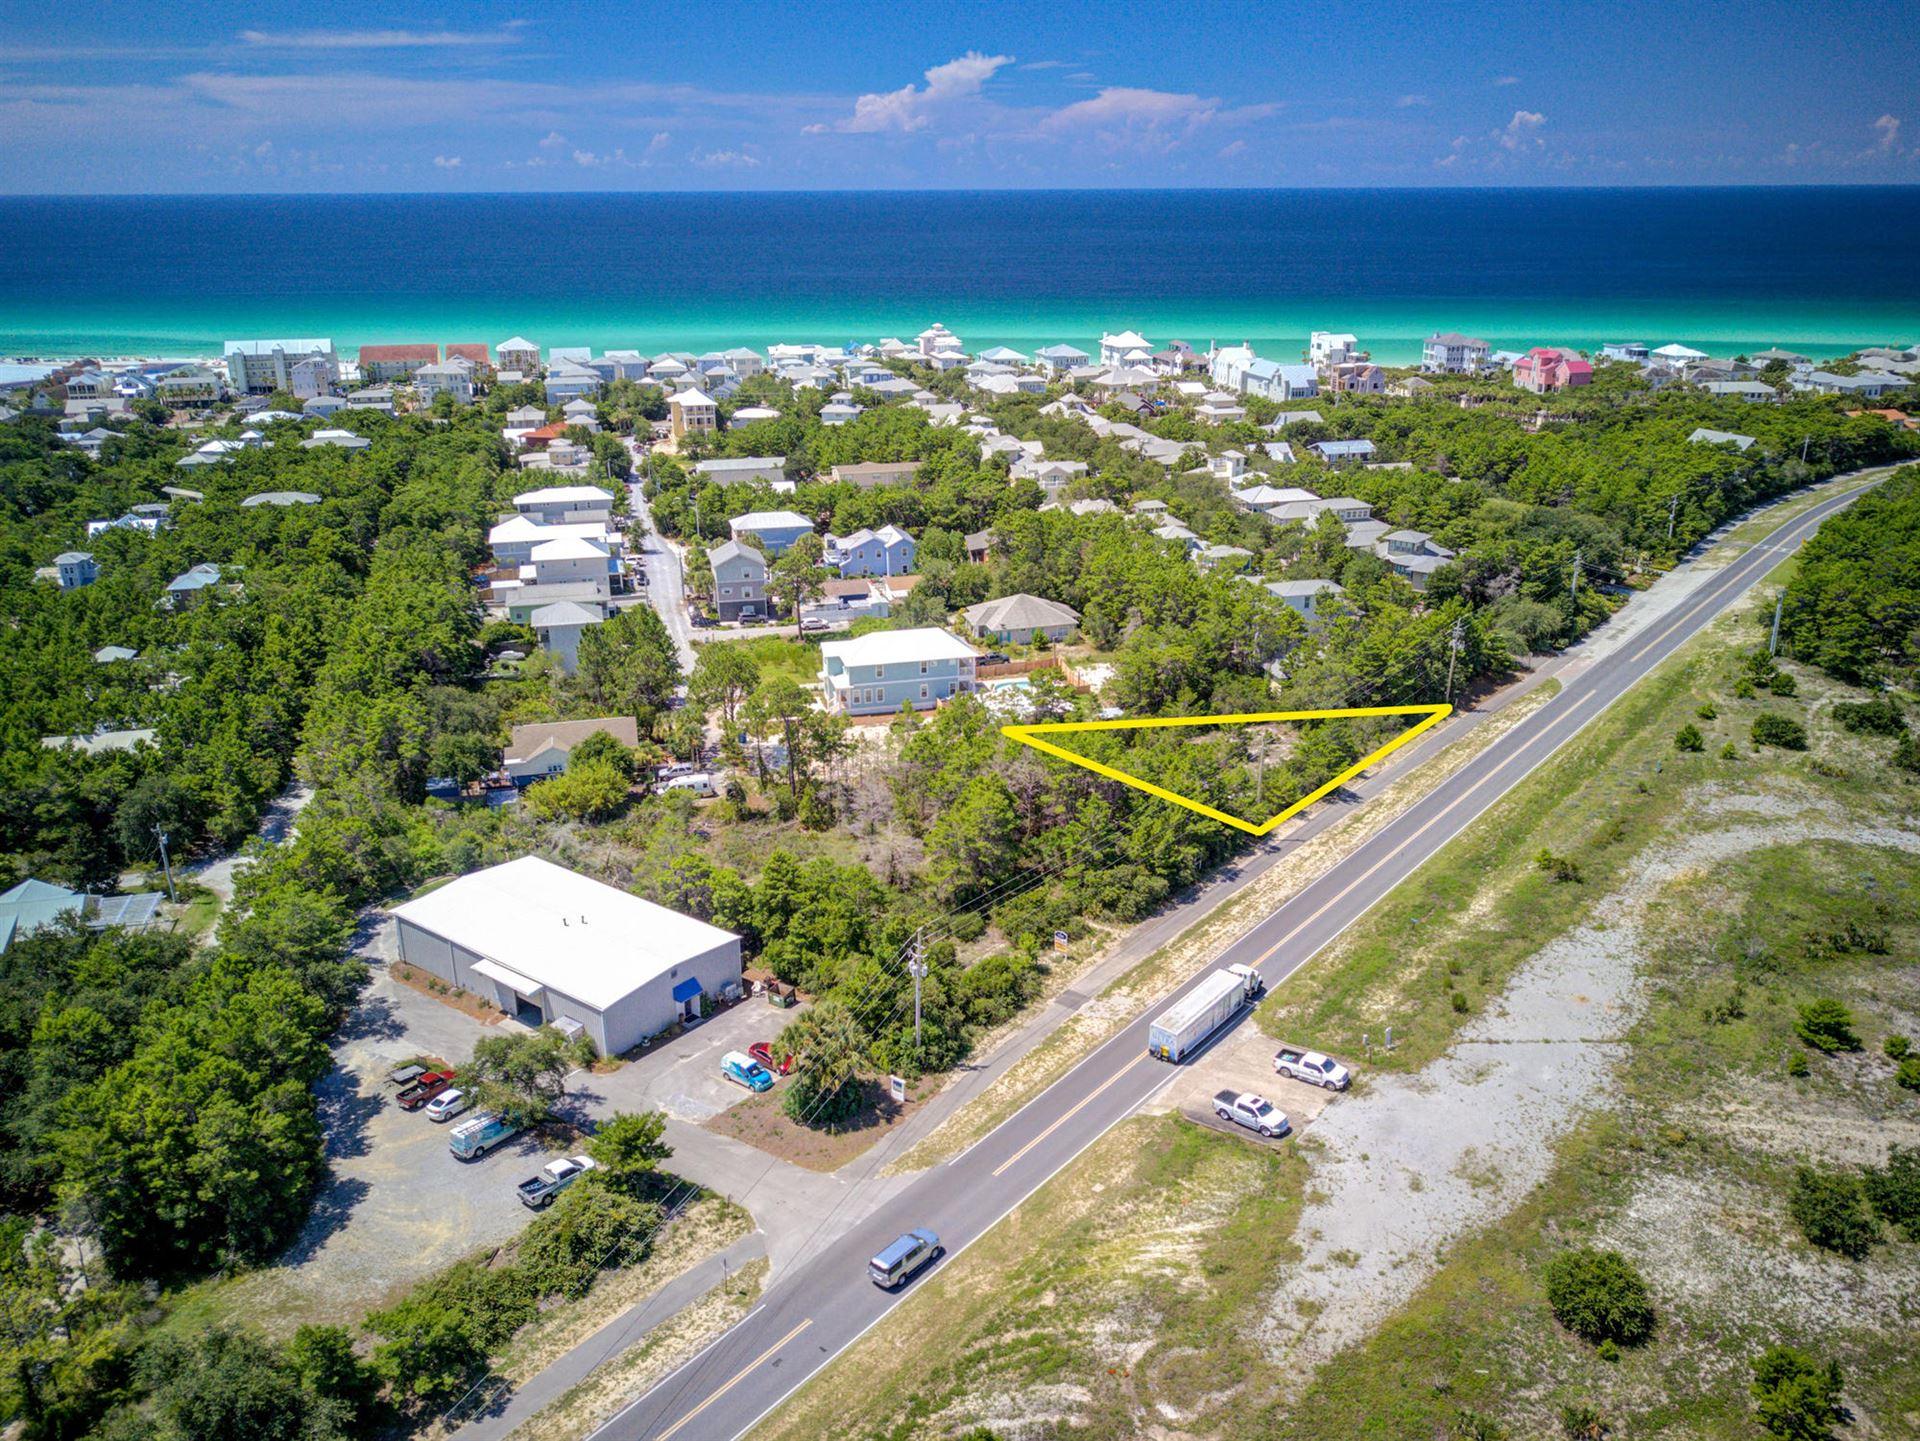 Photo for Lots 5 & 6 E County Hwy 30A, Santa Rosa Beach, FL 32459 (MLS # 815743)